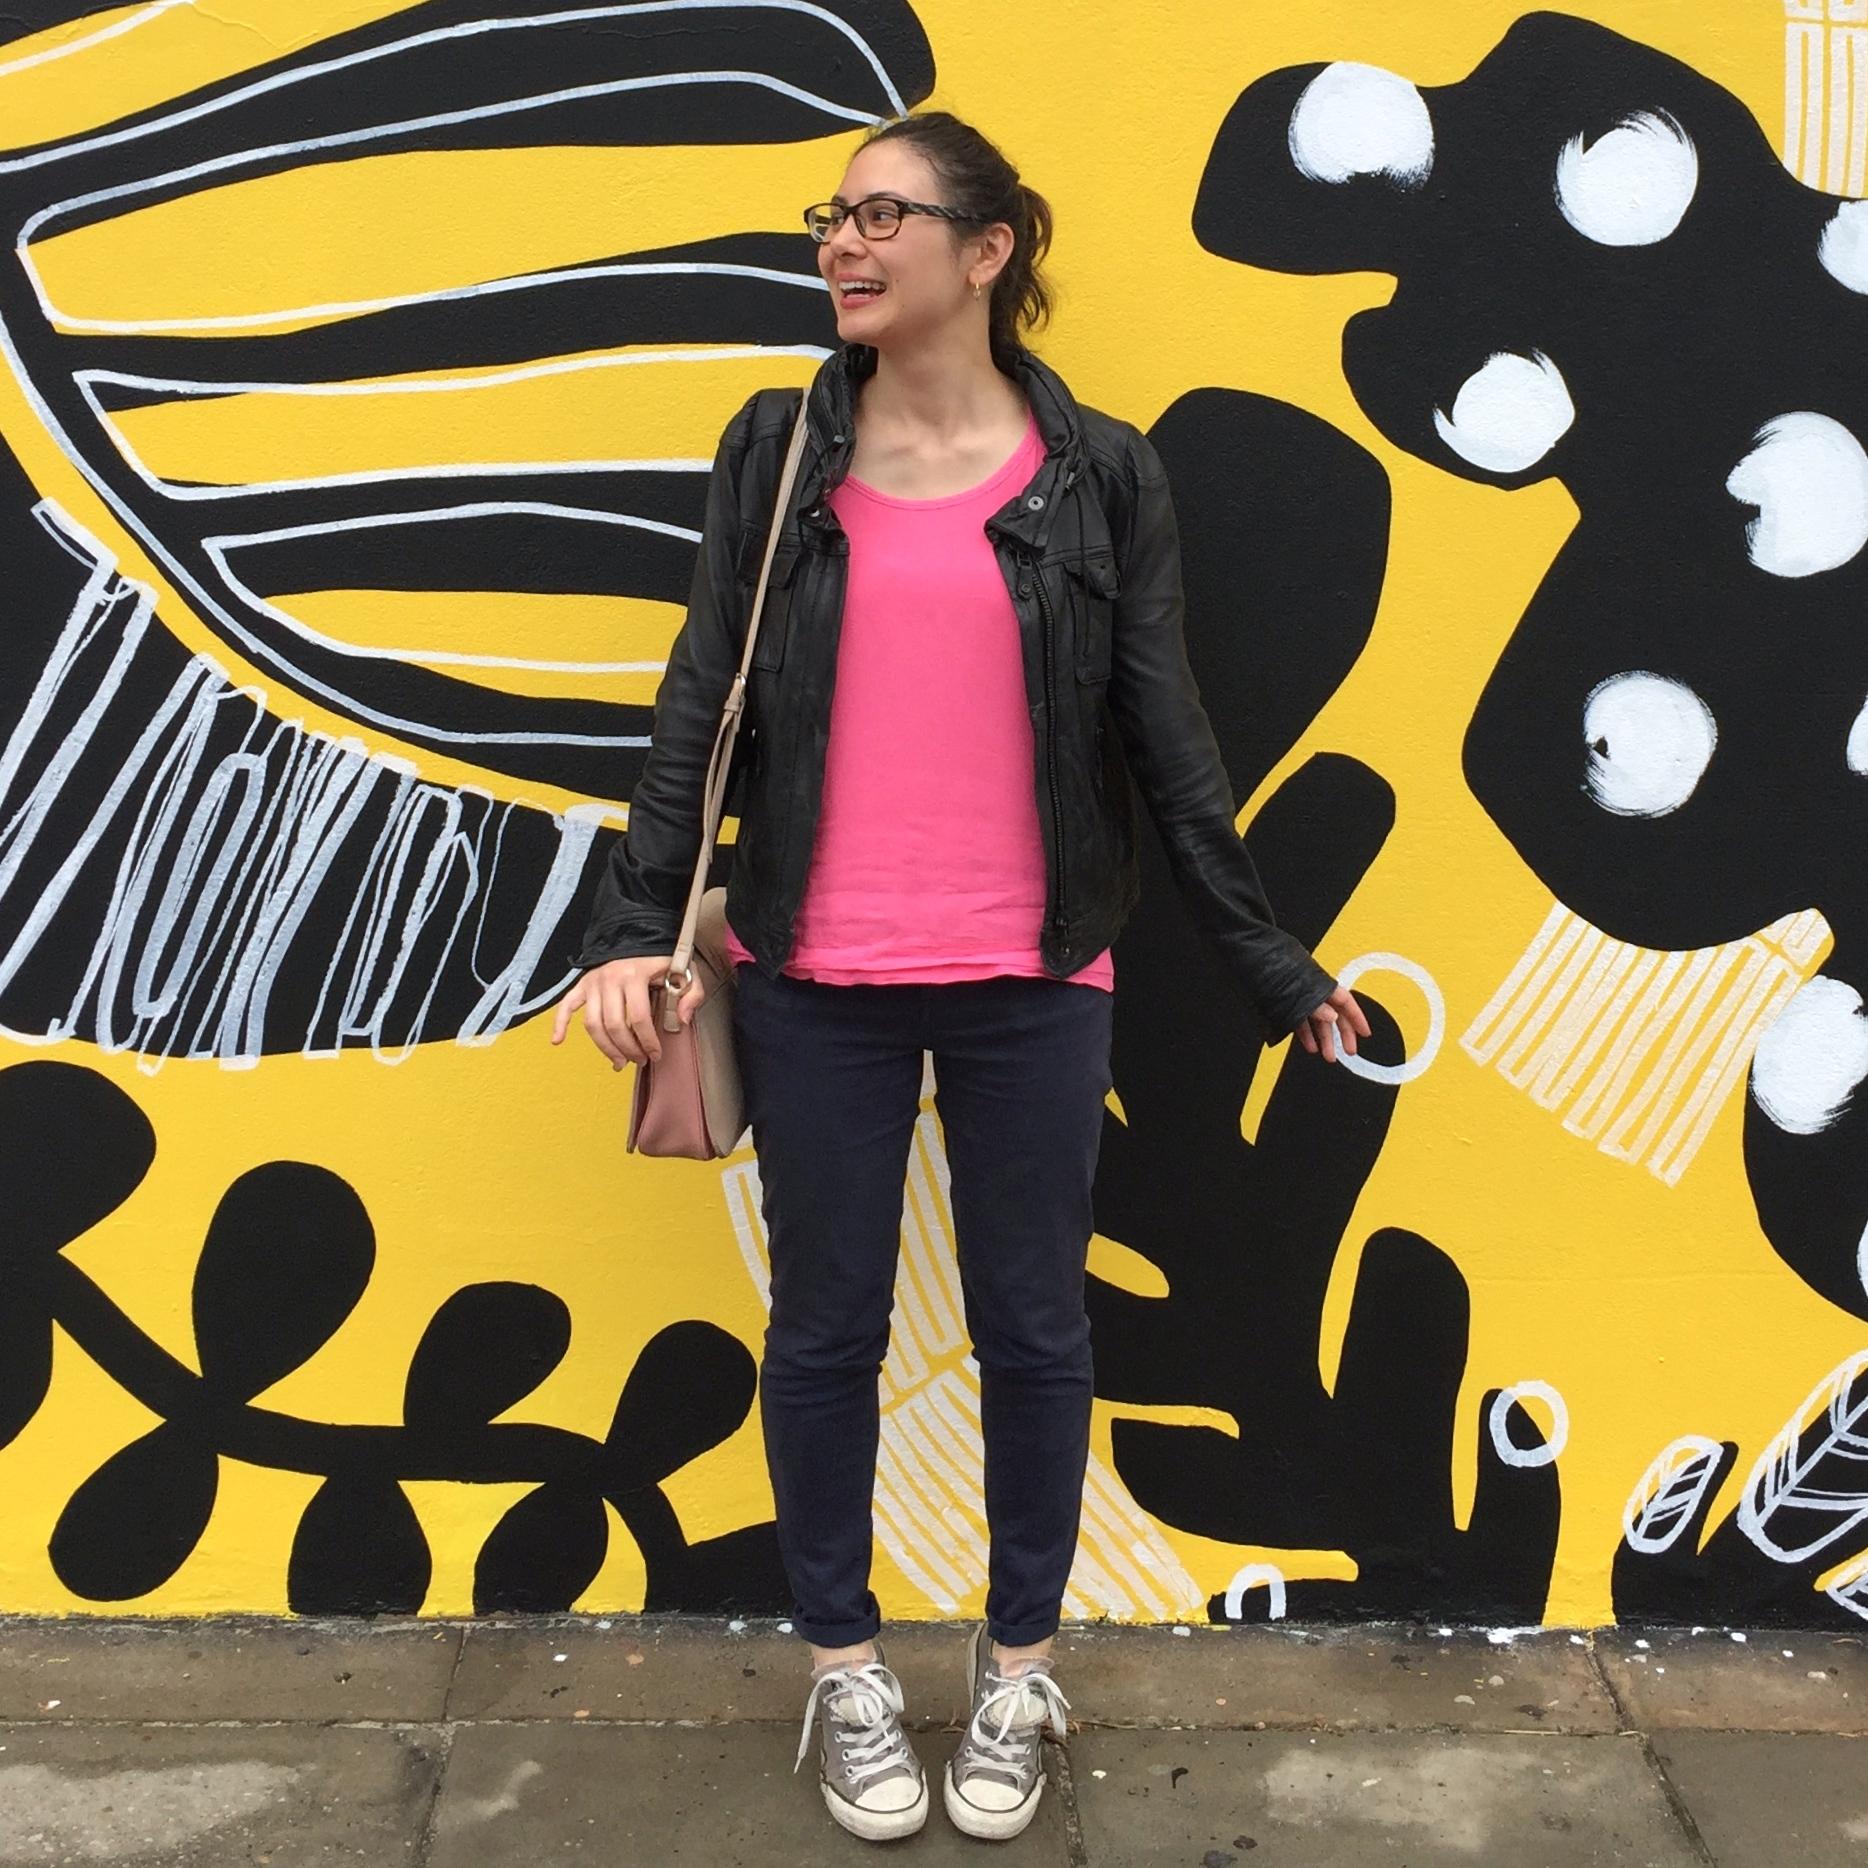 DitchingTheStyleRules-Lauren-Loves-Laughter.jpg